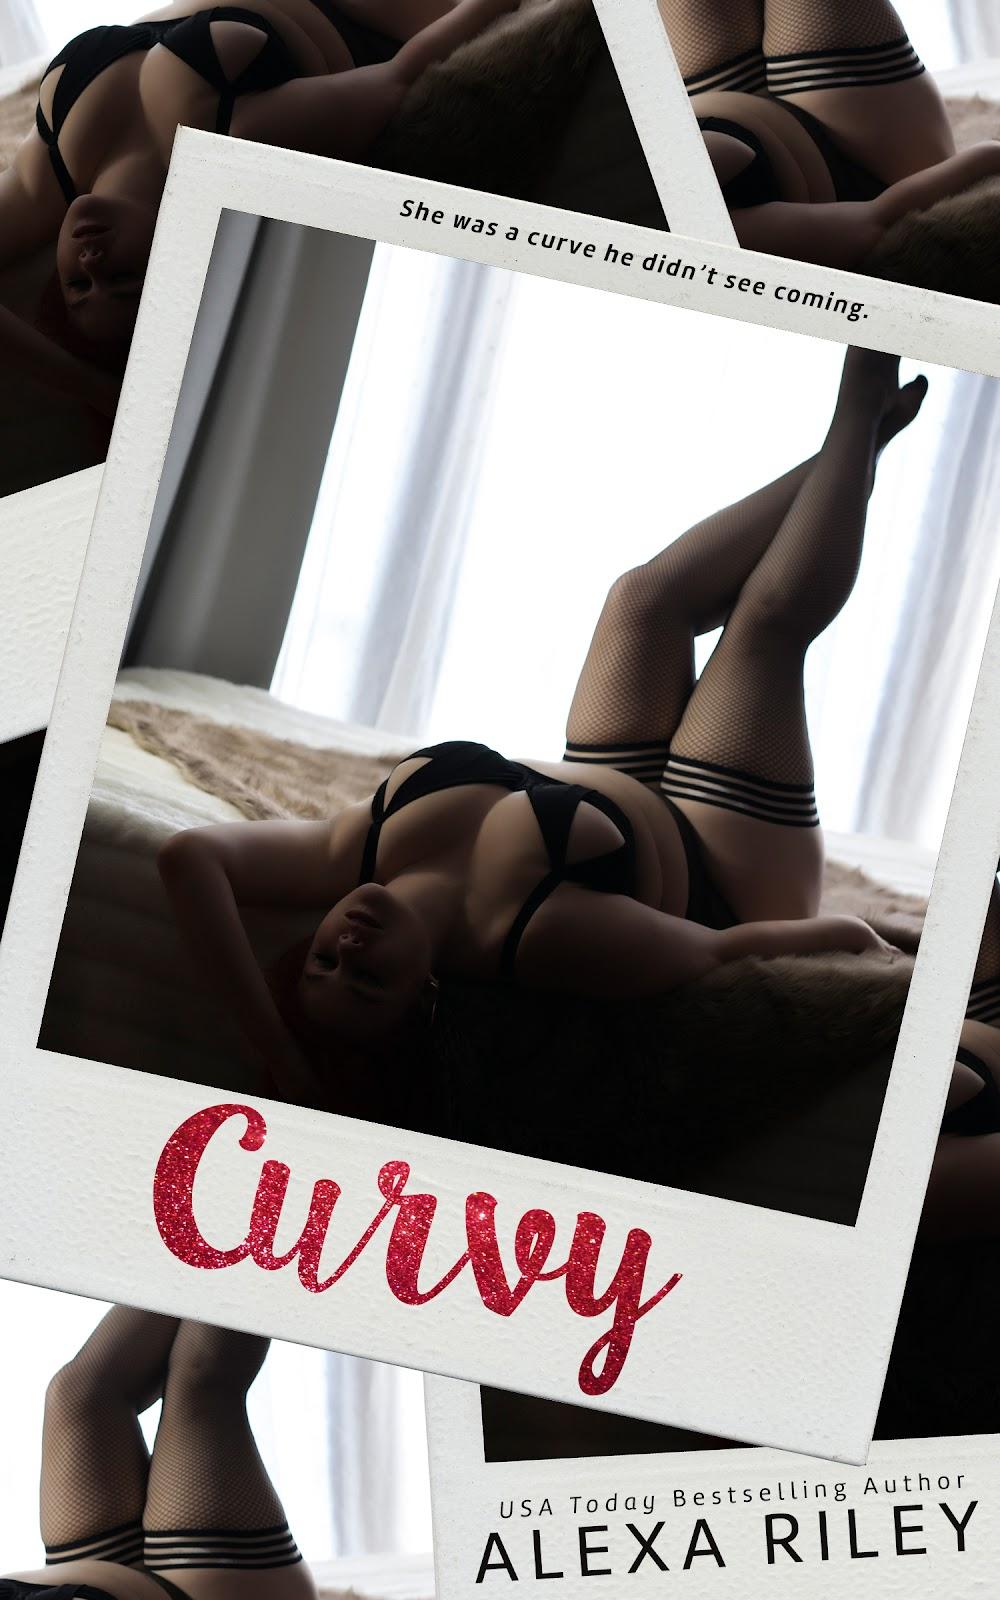 Curvy_Ecover_Final.jpg